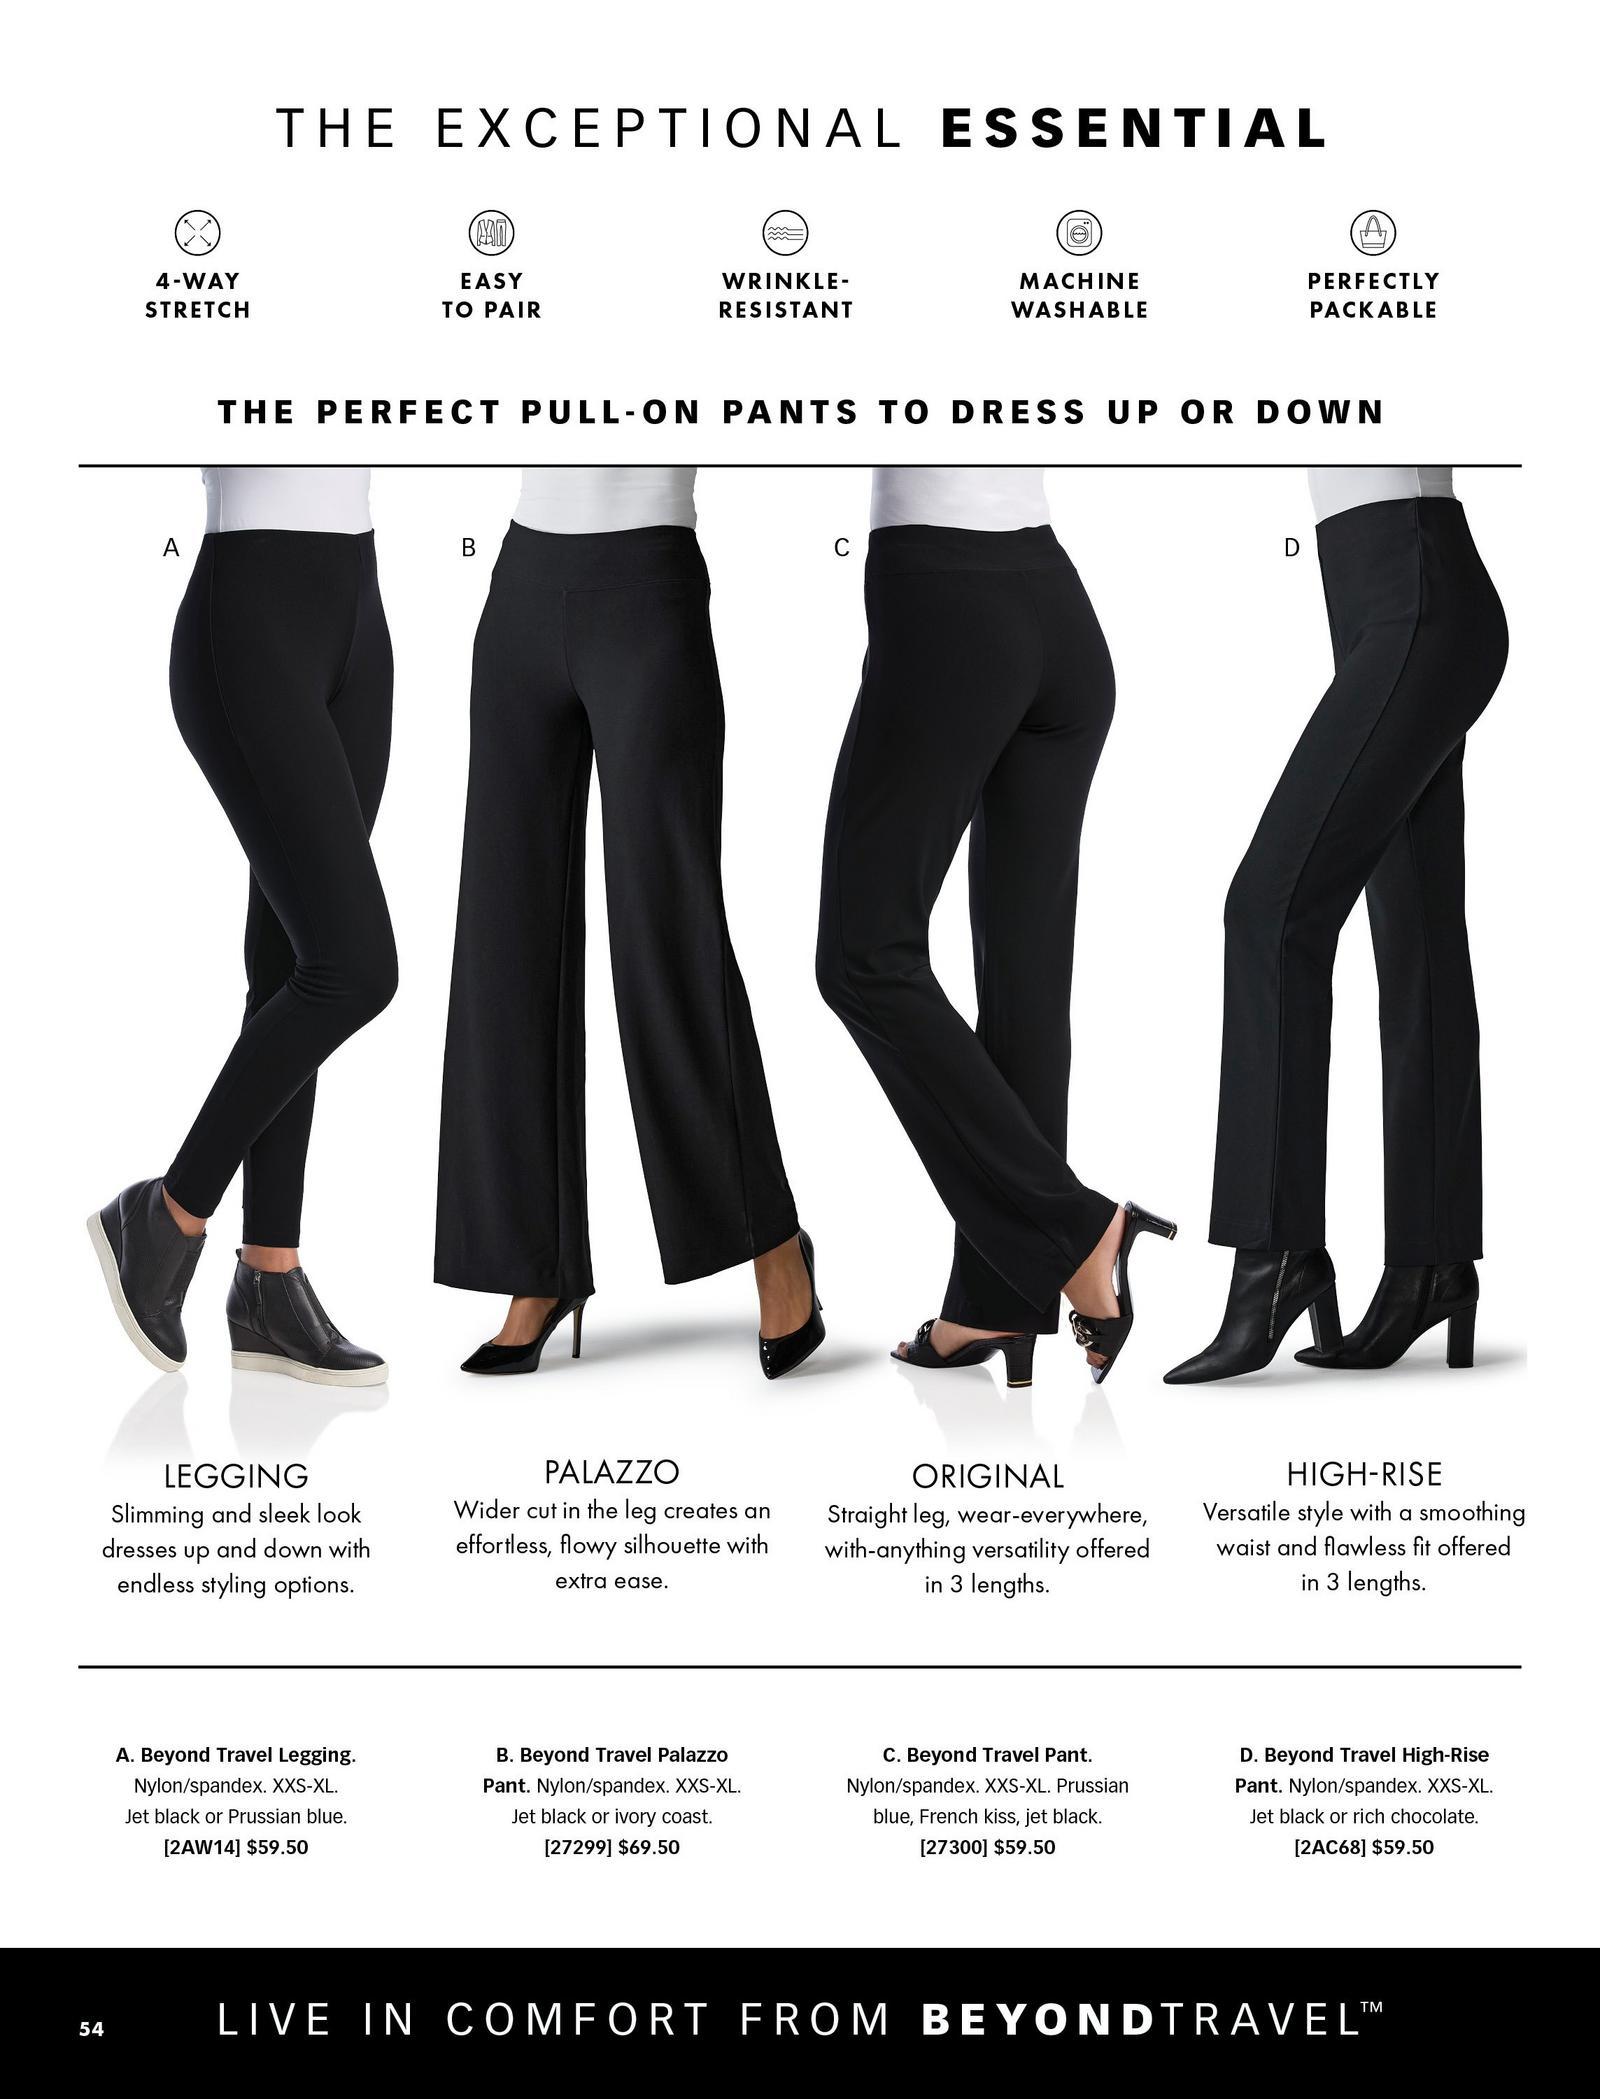 from left to right: black leggings, black palazzo pants, black straight leg pants, black high-waisted straight leg pants.